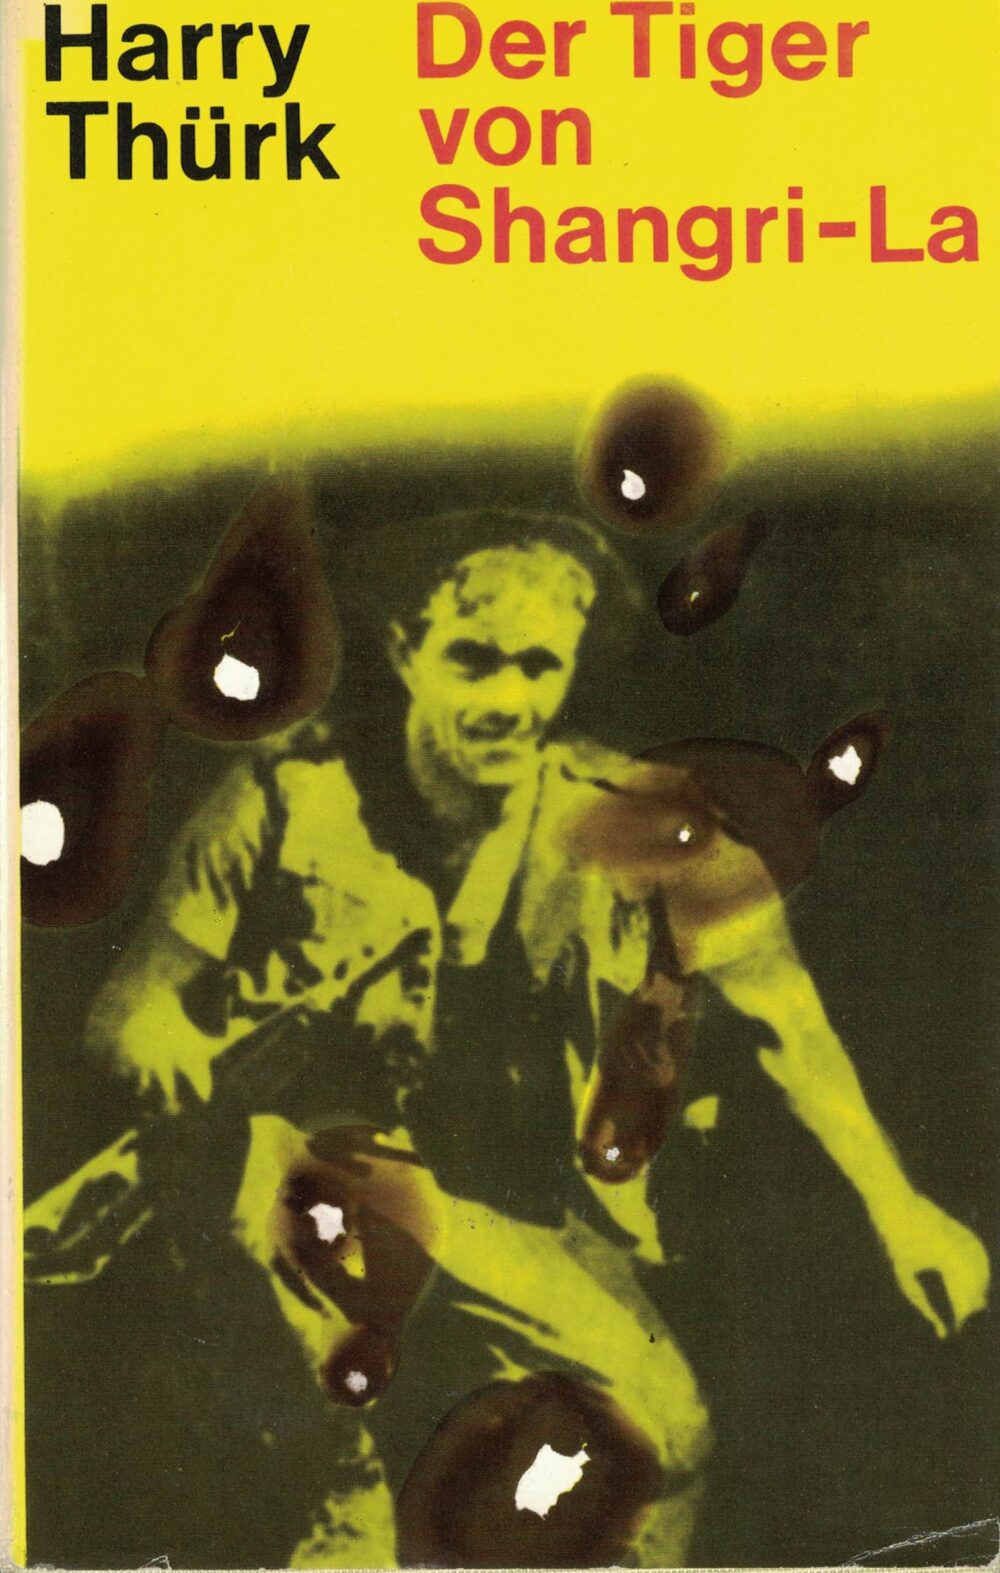 Harry Thürk - Der Tiger von Shangri-La - Roman